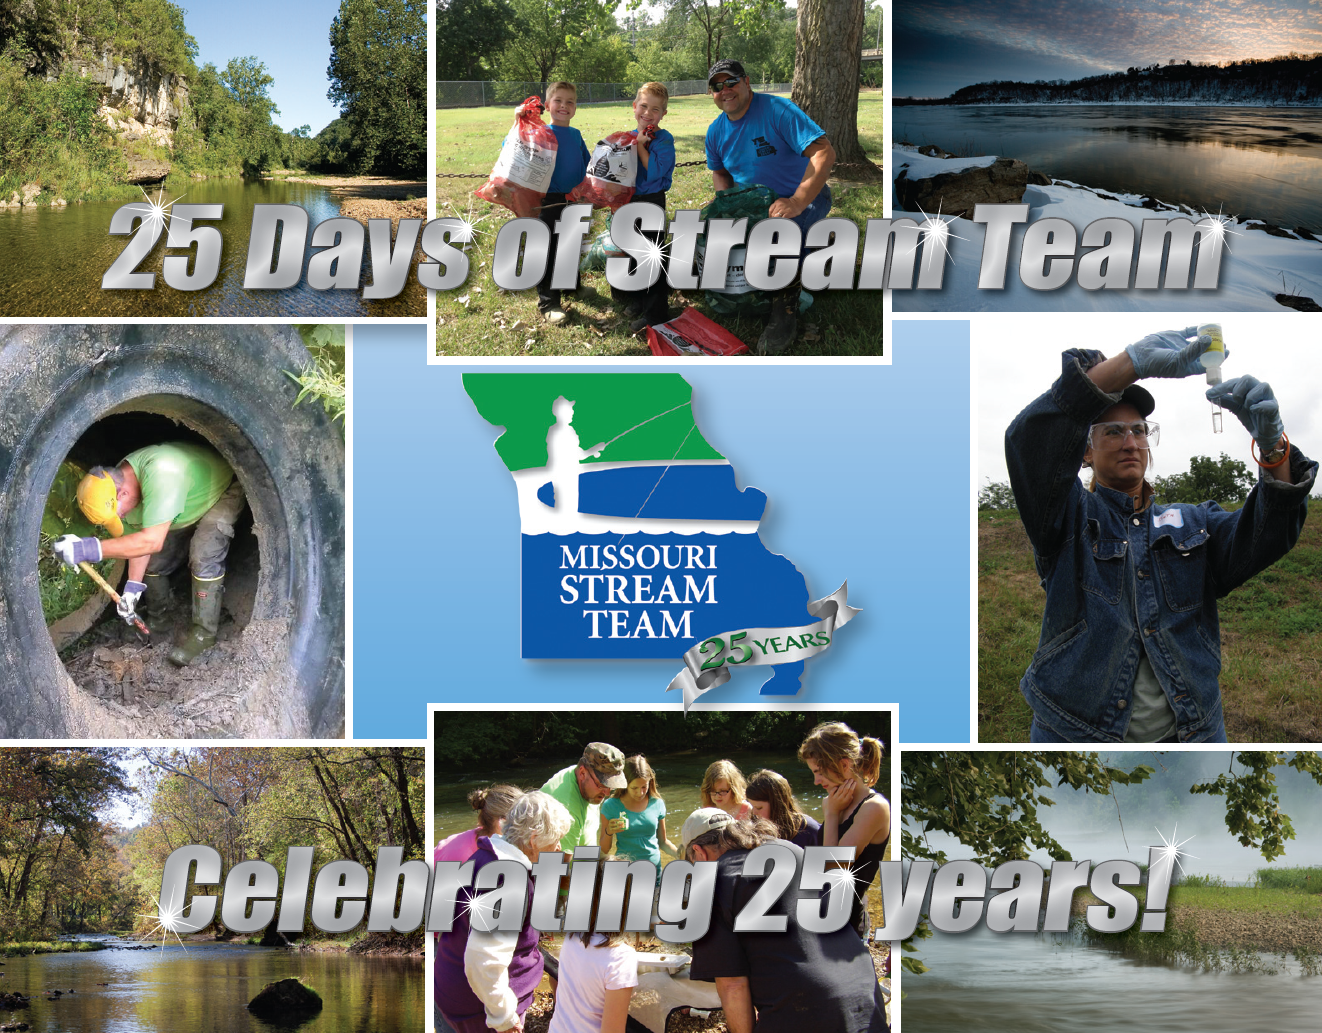 Passport program missouri stream team 25th anniversary heres how it works ccuart Images